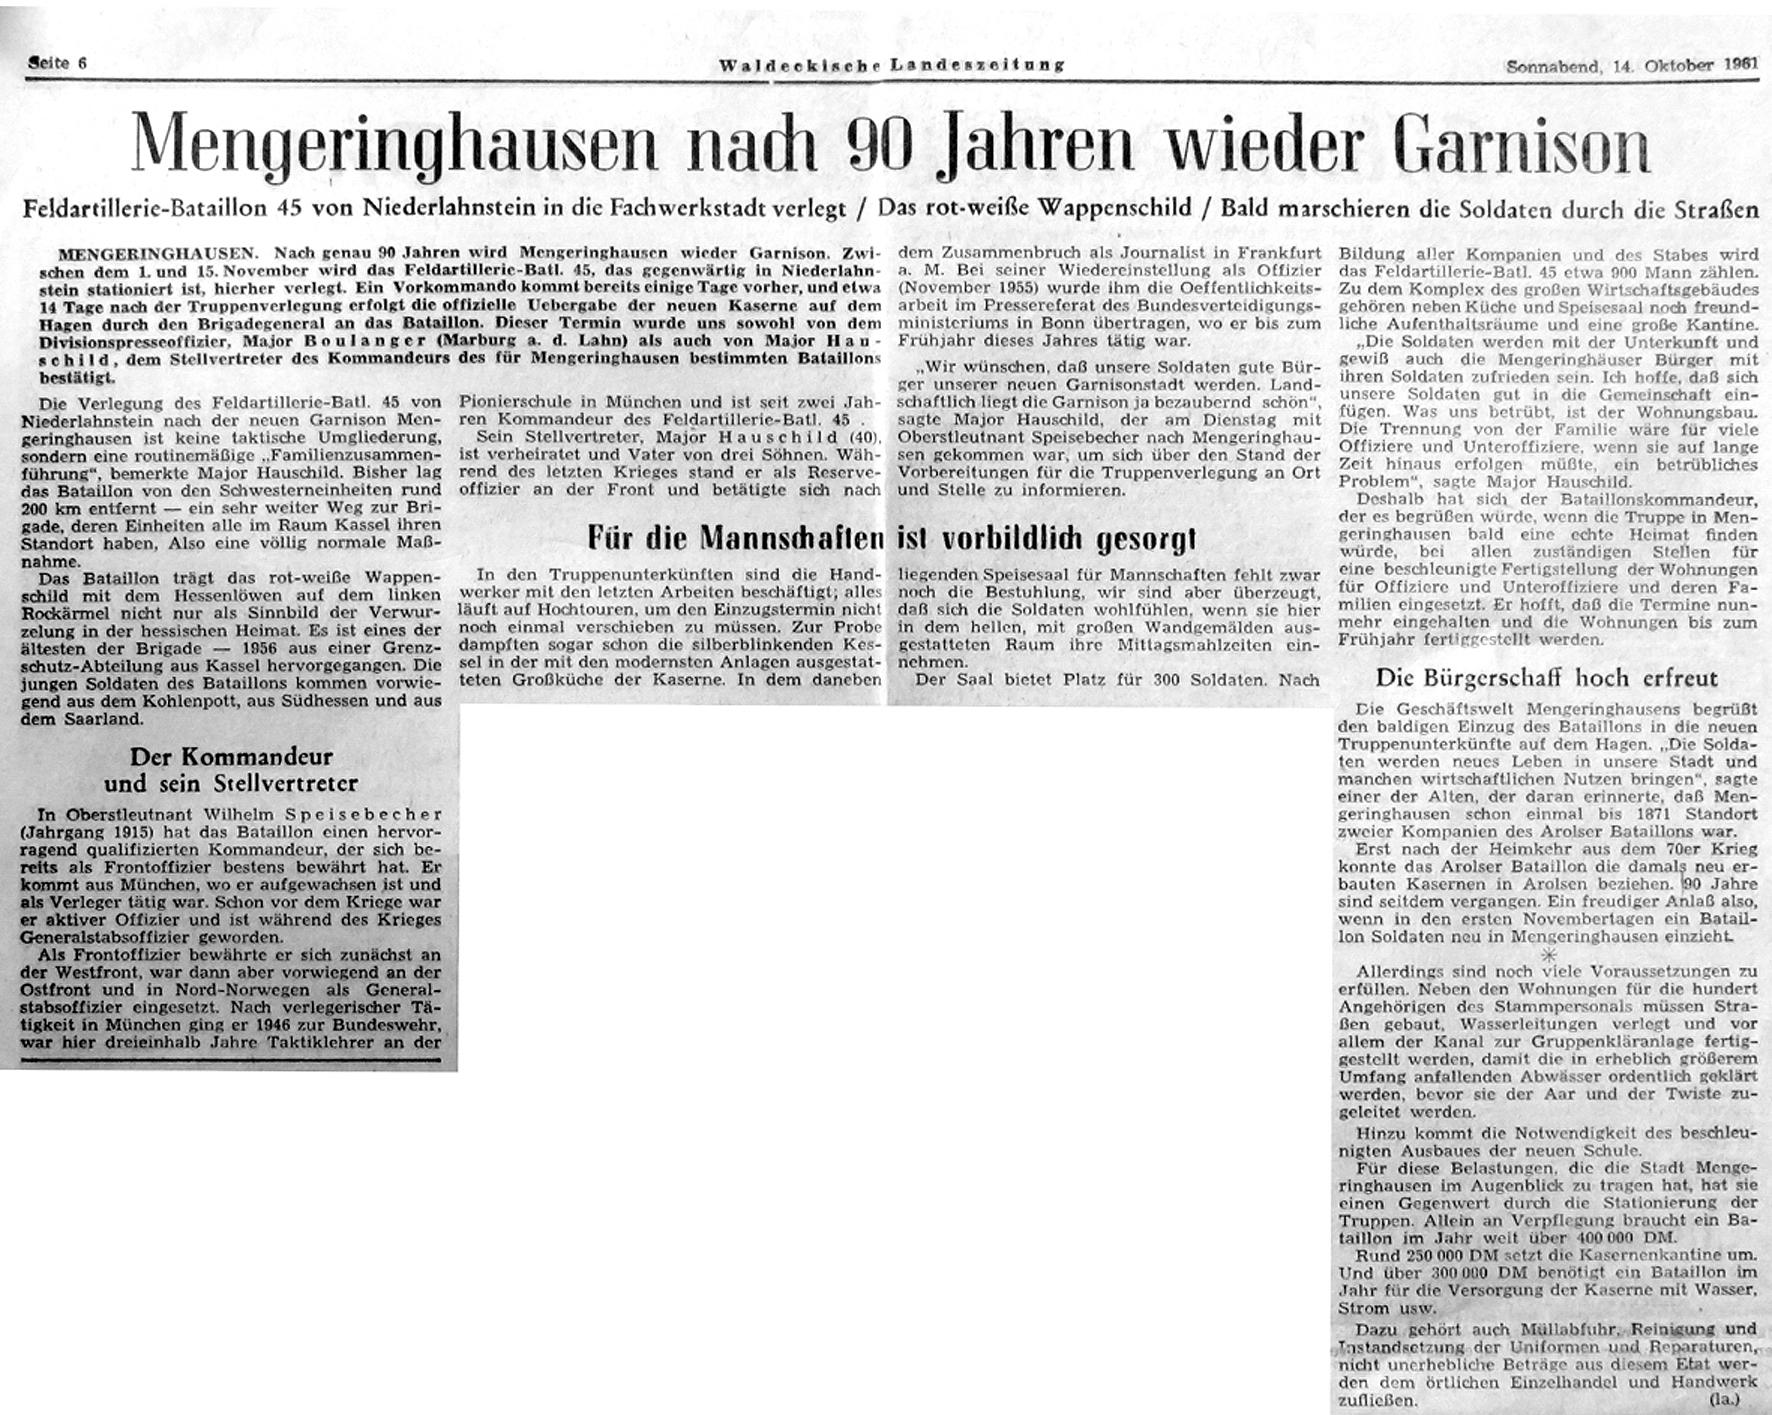 Mengeringhsn Presse 14.10.61